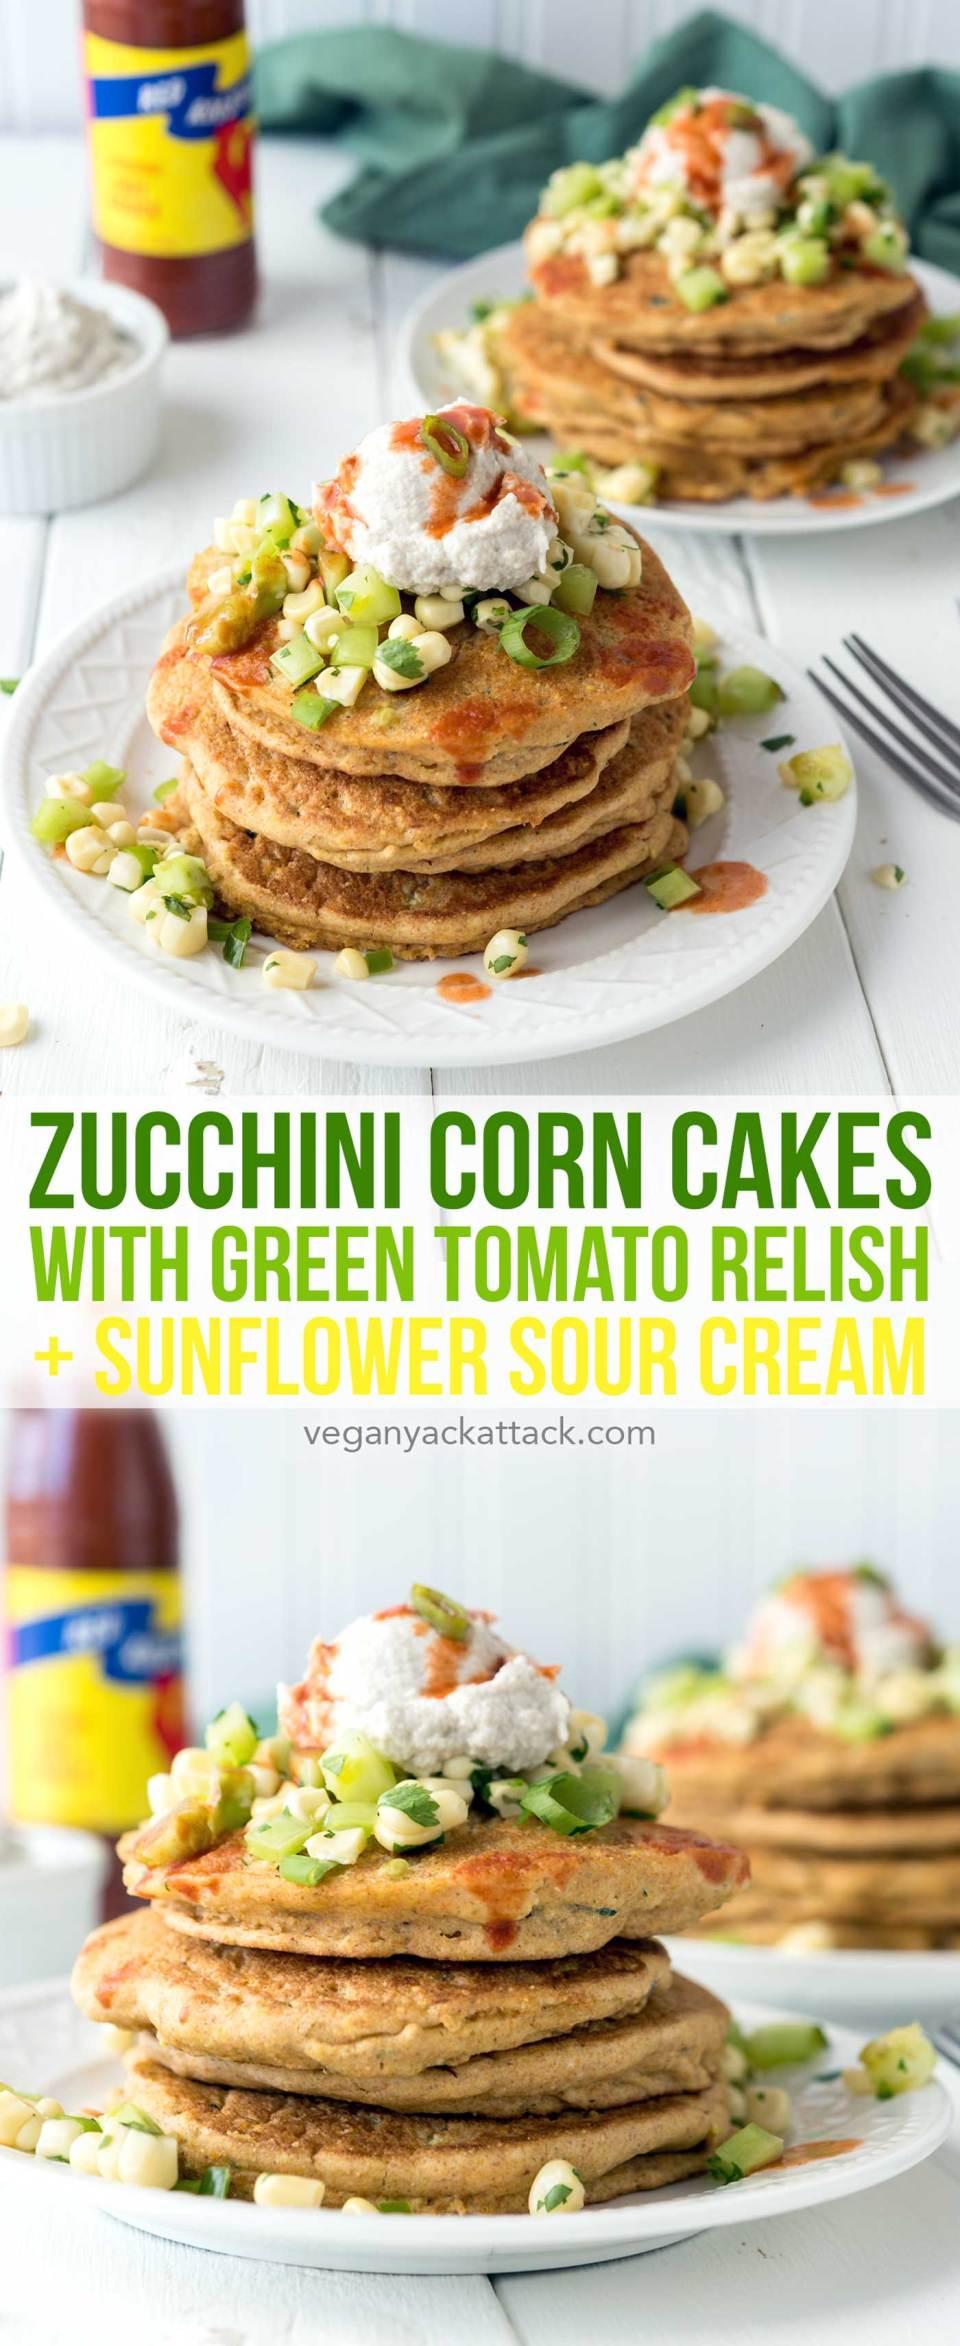 Zucchini Corn Cakes with Green Tomato Relish + Sunflower Sour Cream! A wonderful, savory, summer breakfast. #vegan #soyfree #nutfree #veganyackattack